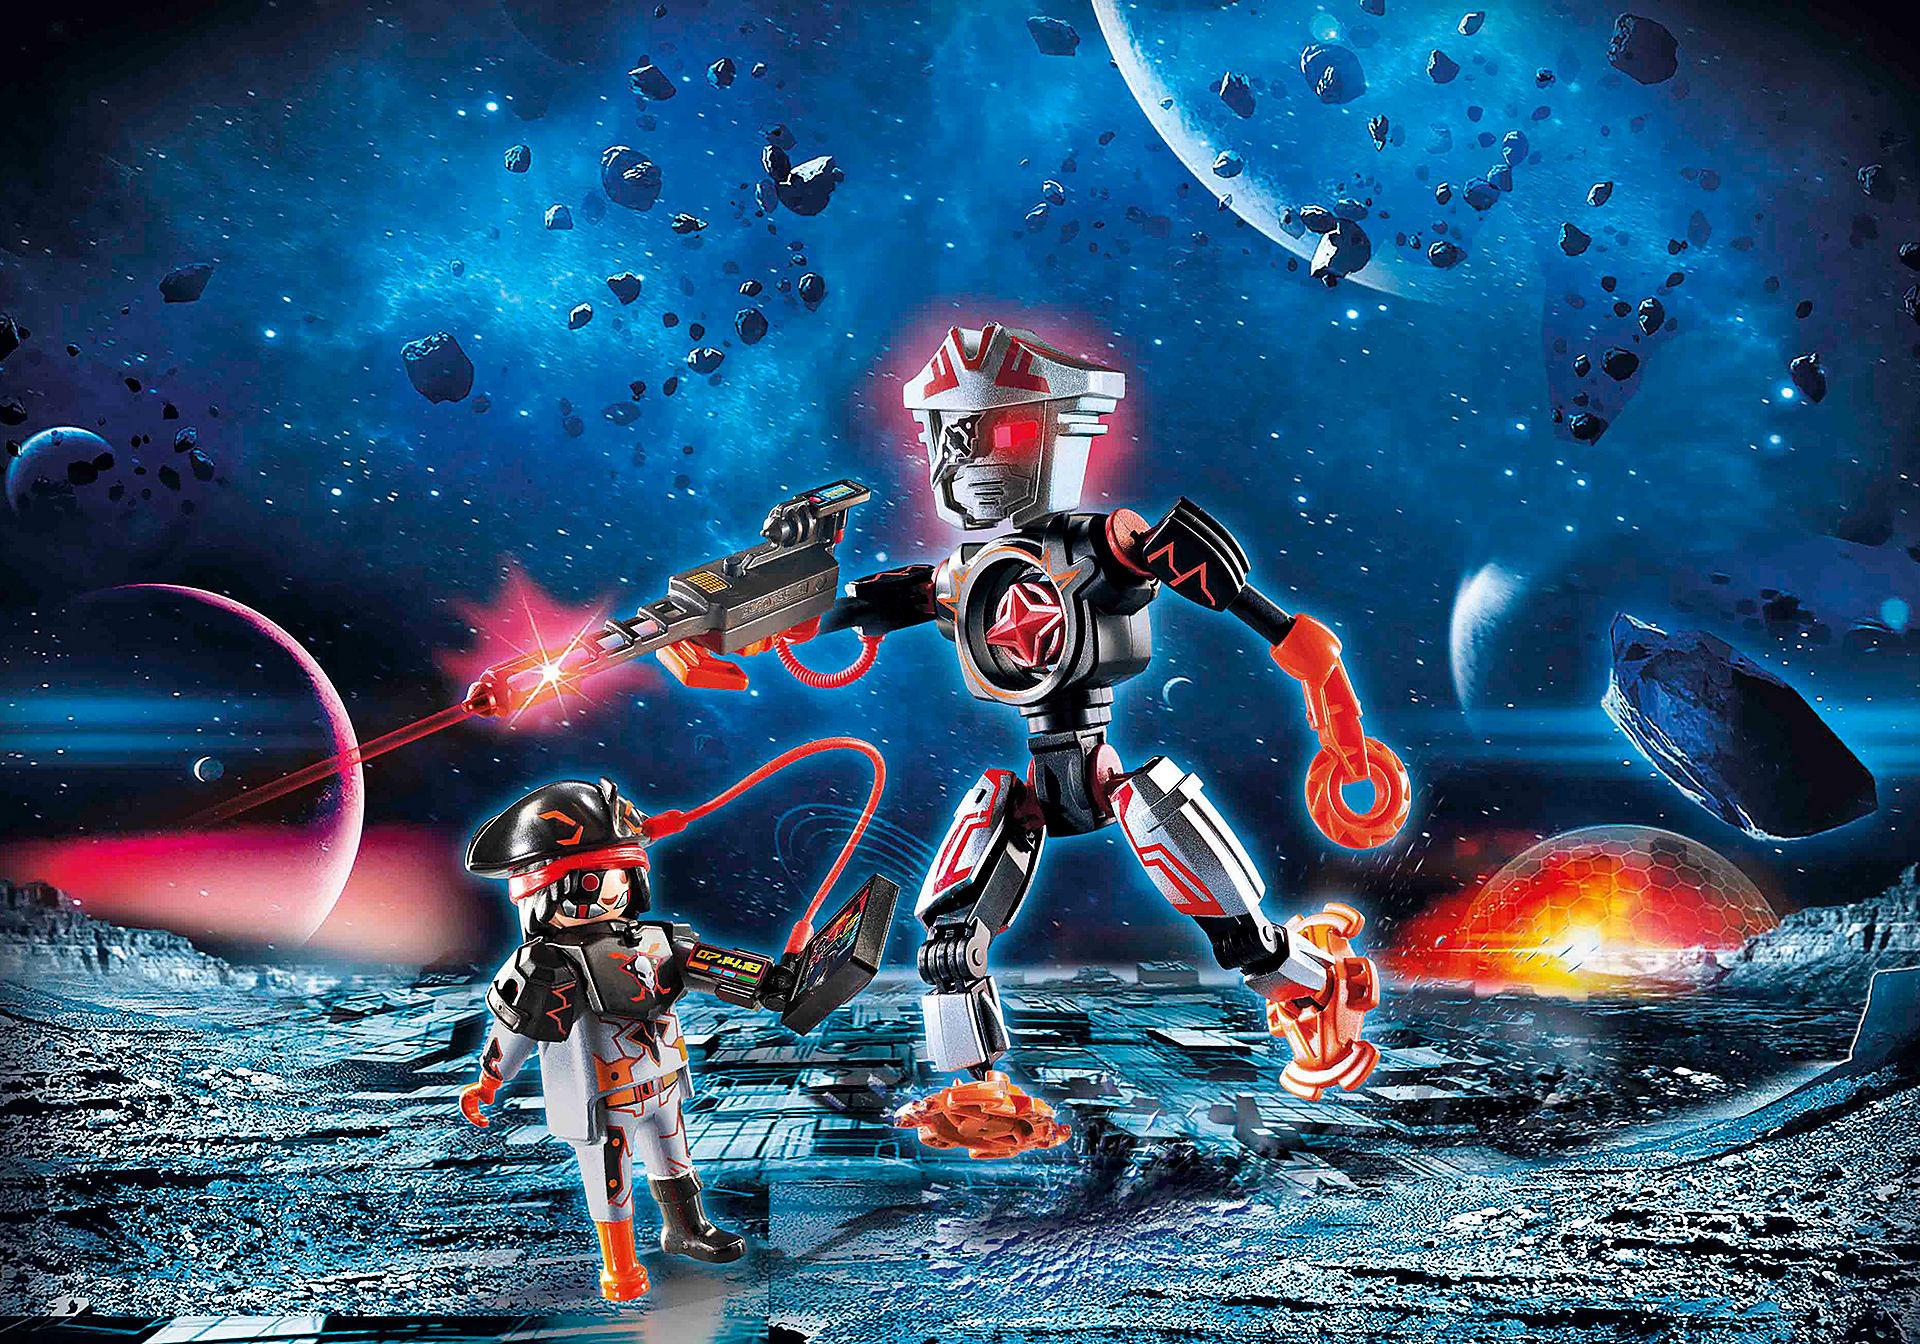 70024 Galaxy piratrobot zoom image1